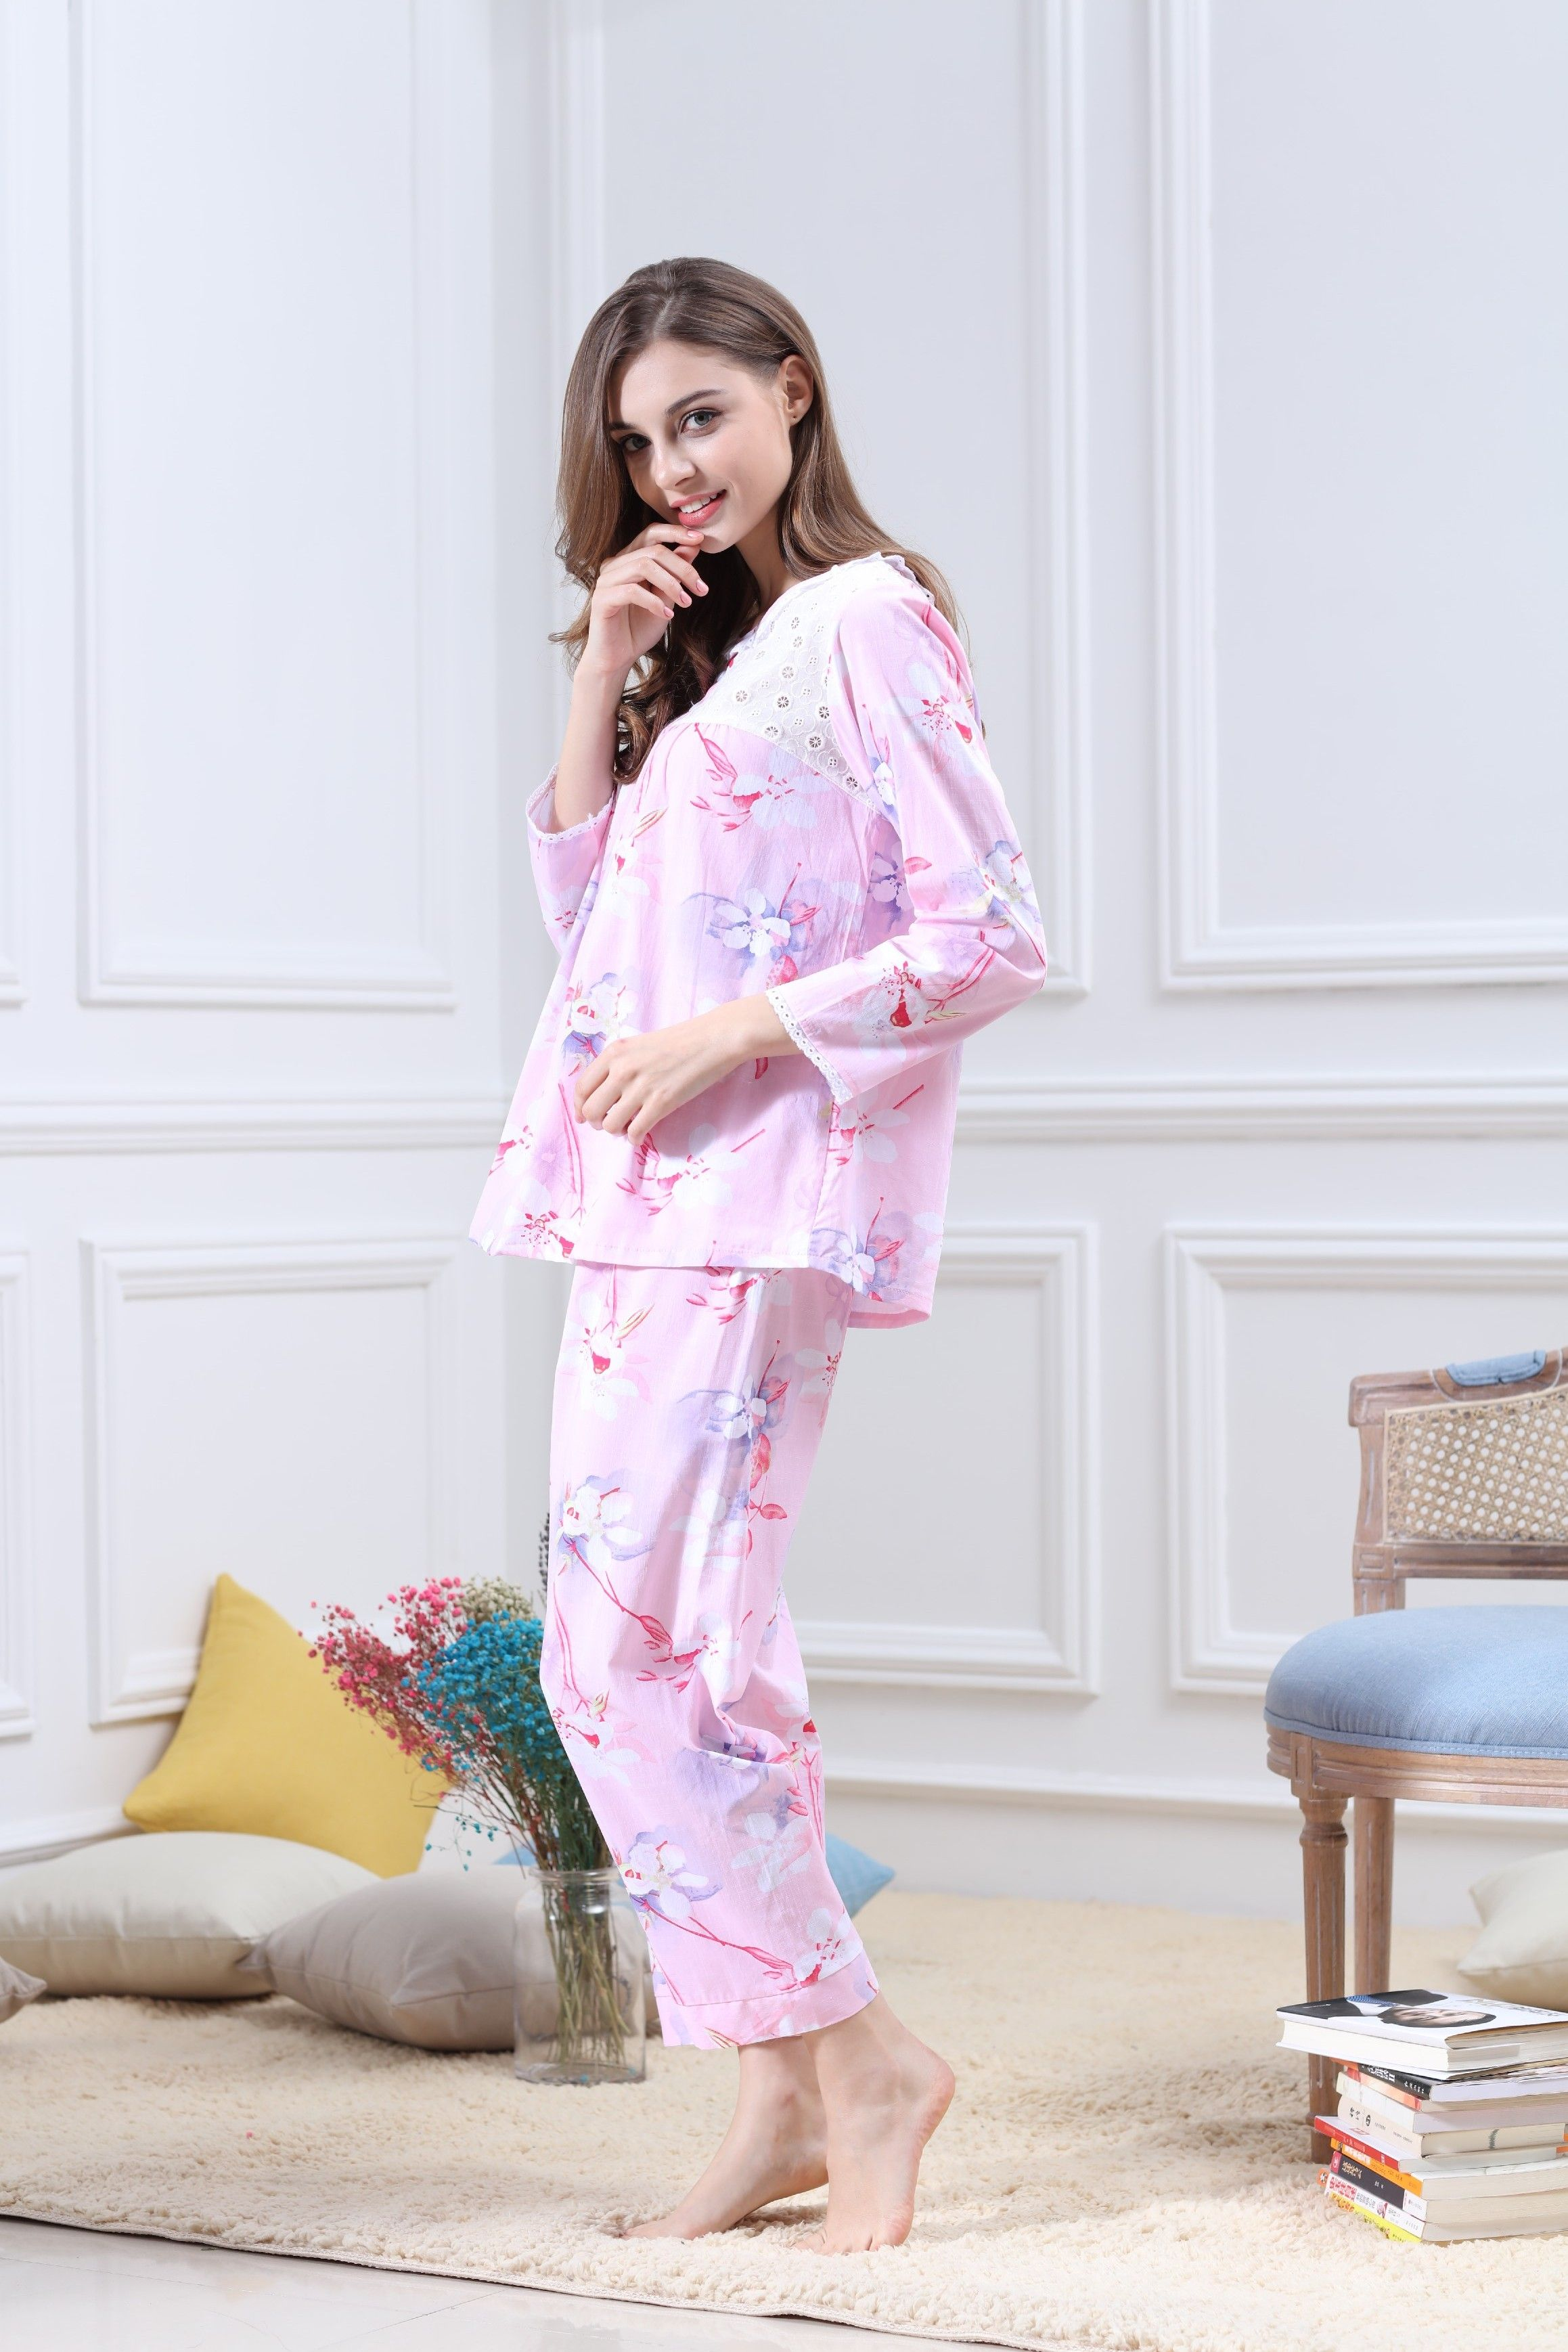 b11f6575b5  Womens  Pajamas  Cotton  Sleepwear  TwoPiecesSets  HomeService  Soft   Bedwear  LongSleeves